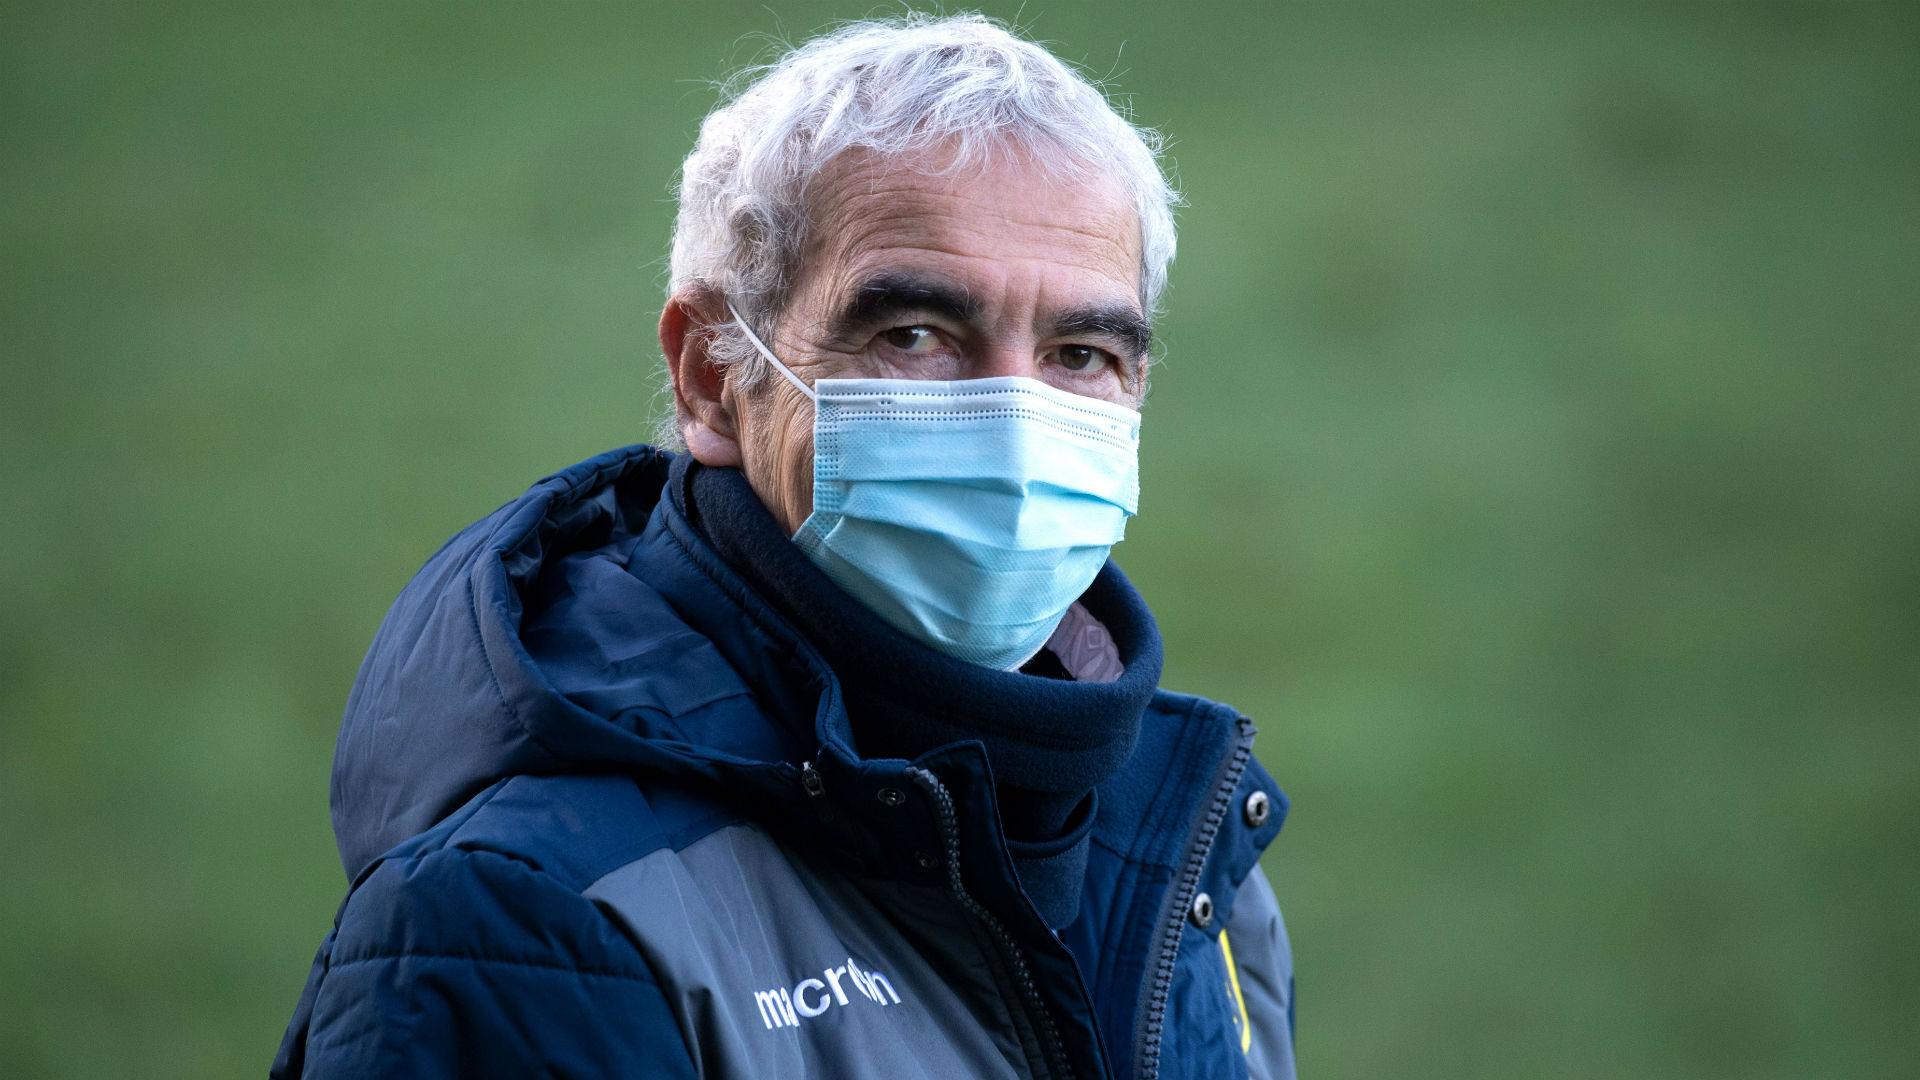 'I would've wanted to sign Maradona but he's dead' – Nantes boss Domenech in bizarre transfer quip